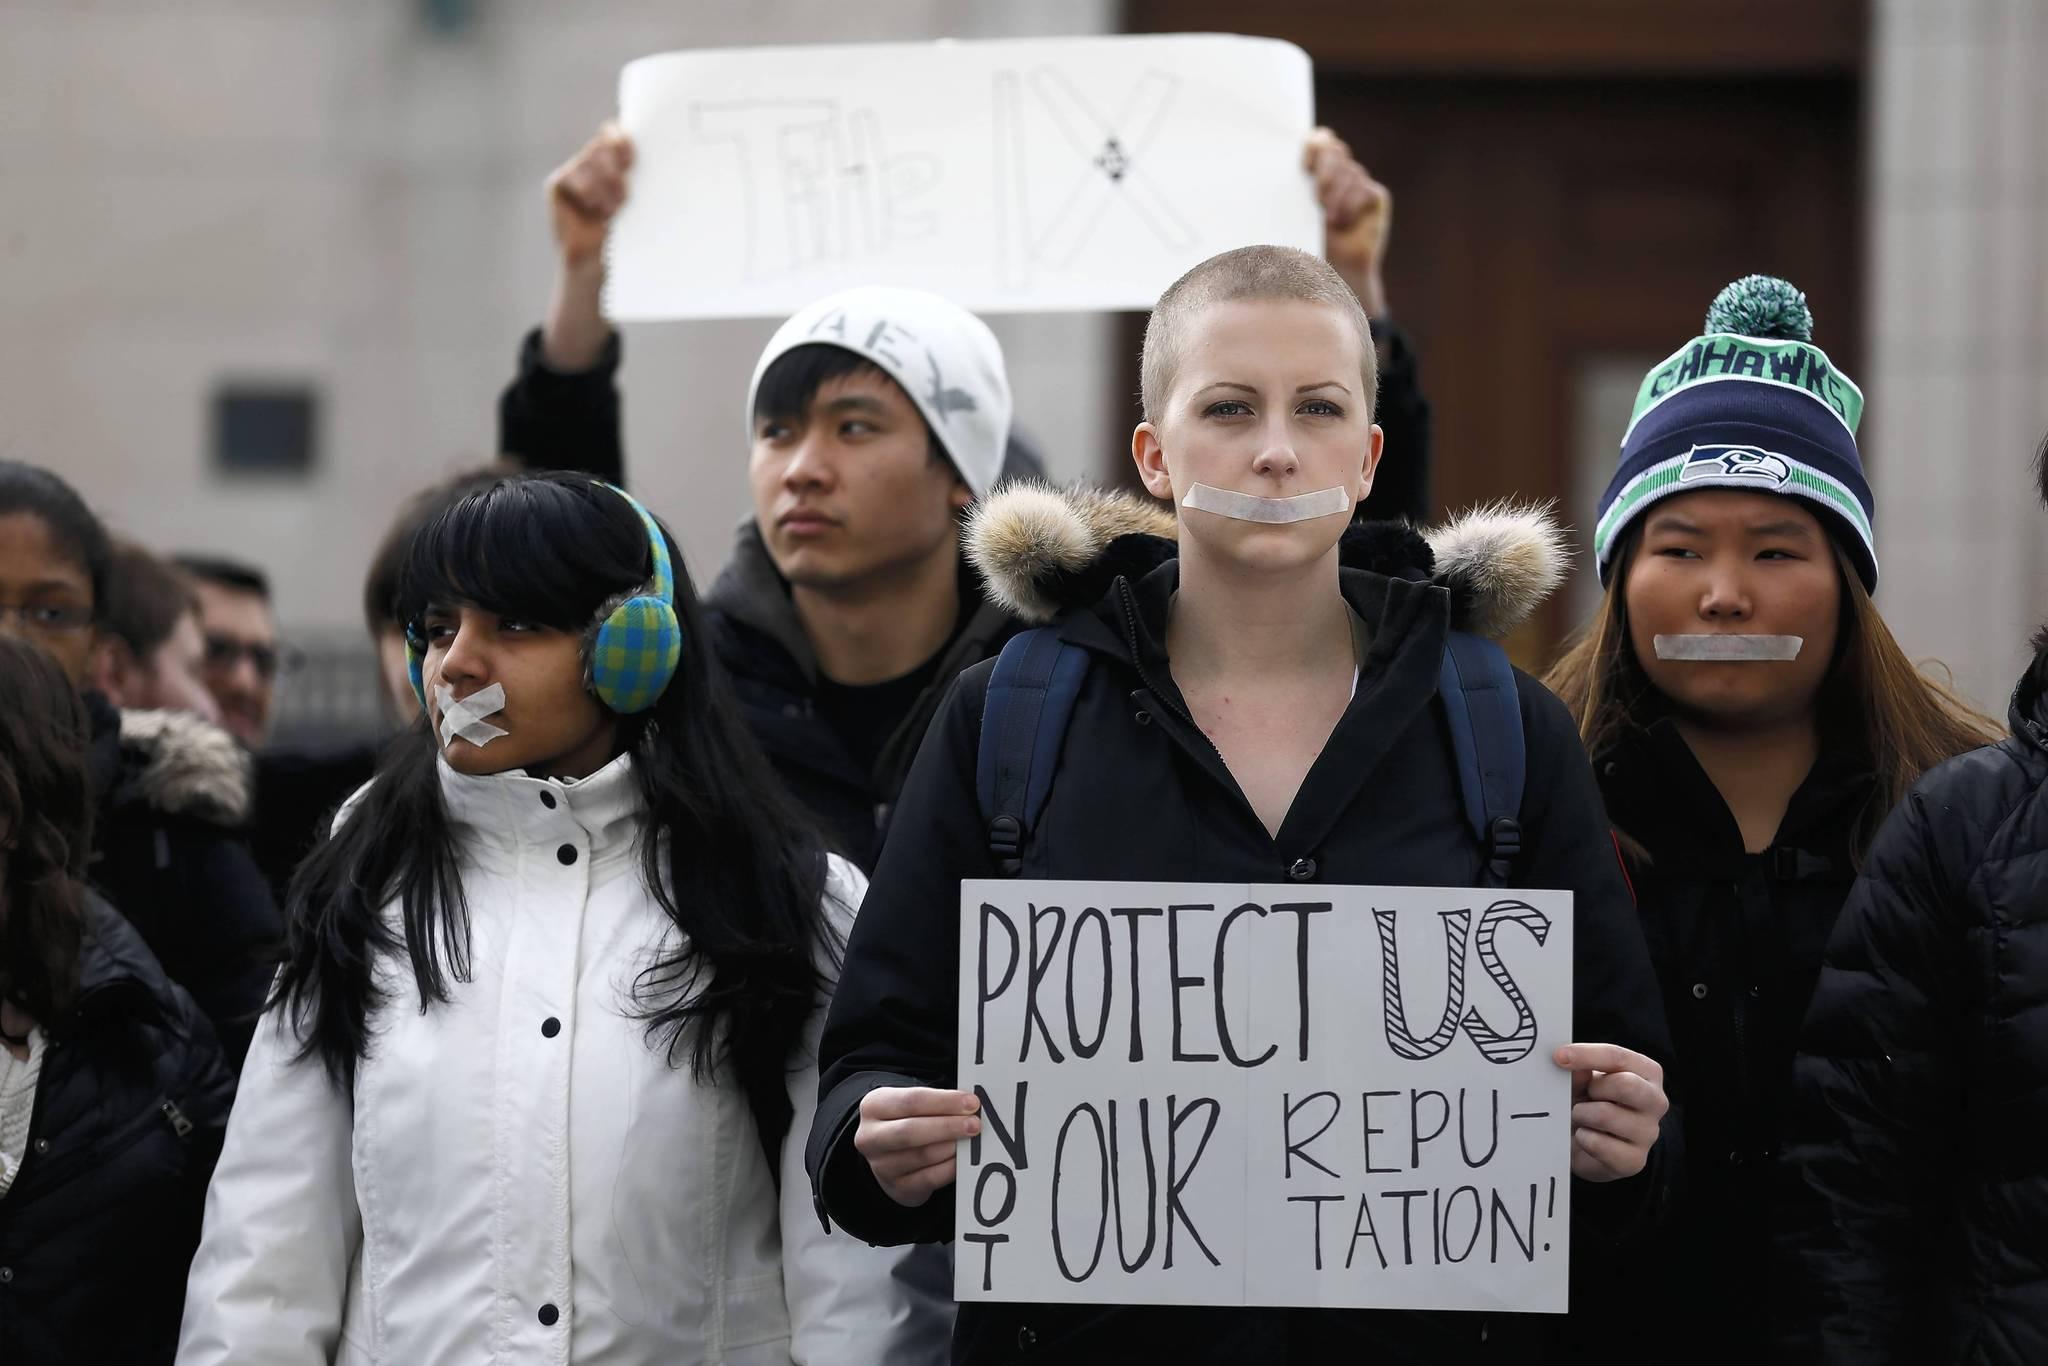 Northwestern: Professor accused of sexual misconduct won't teach rest of school year